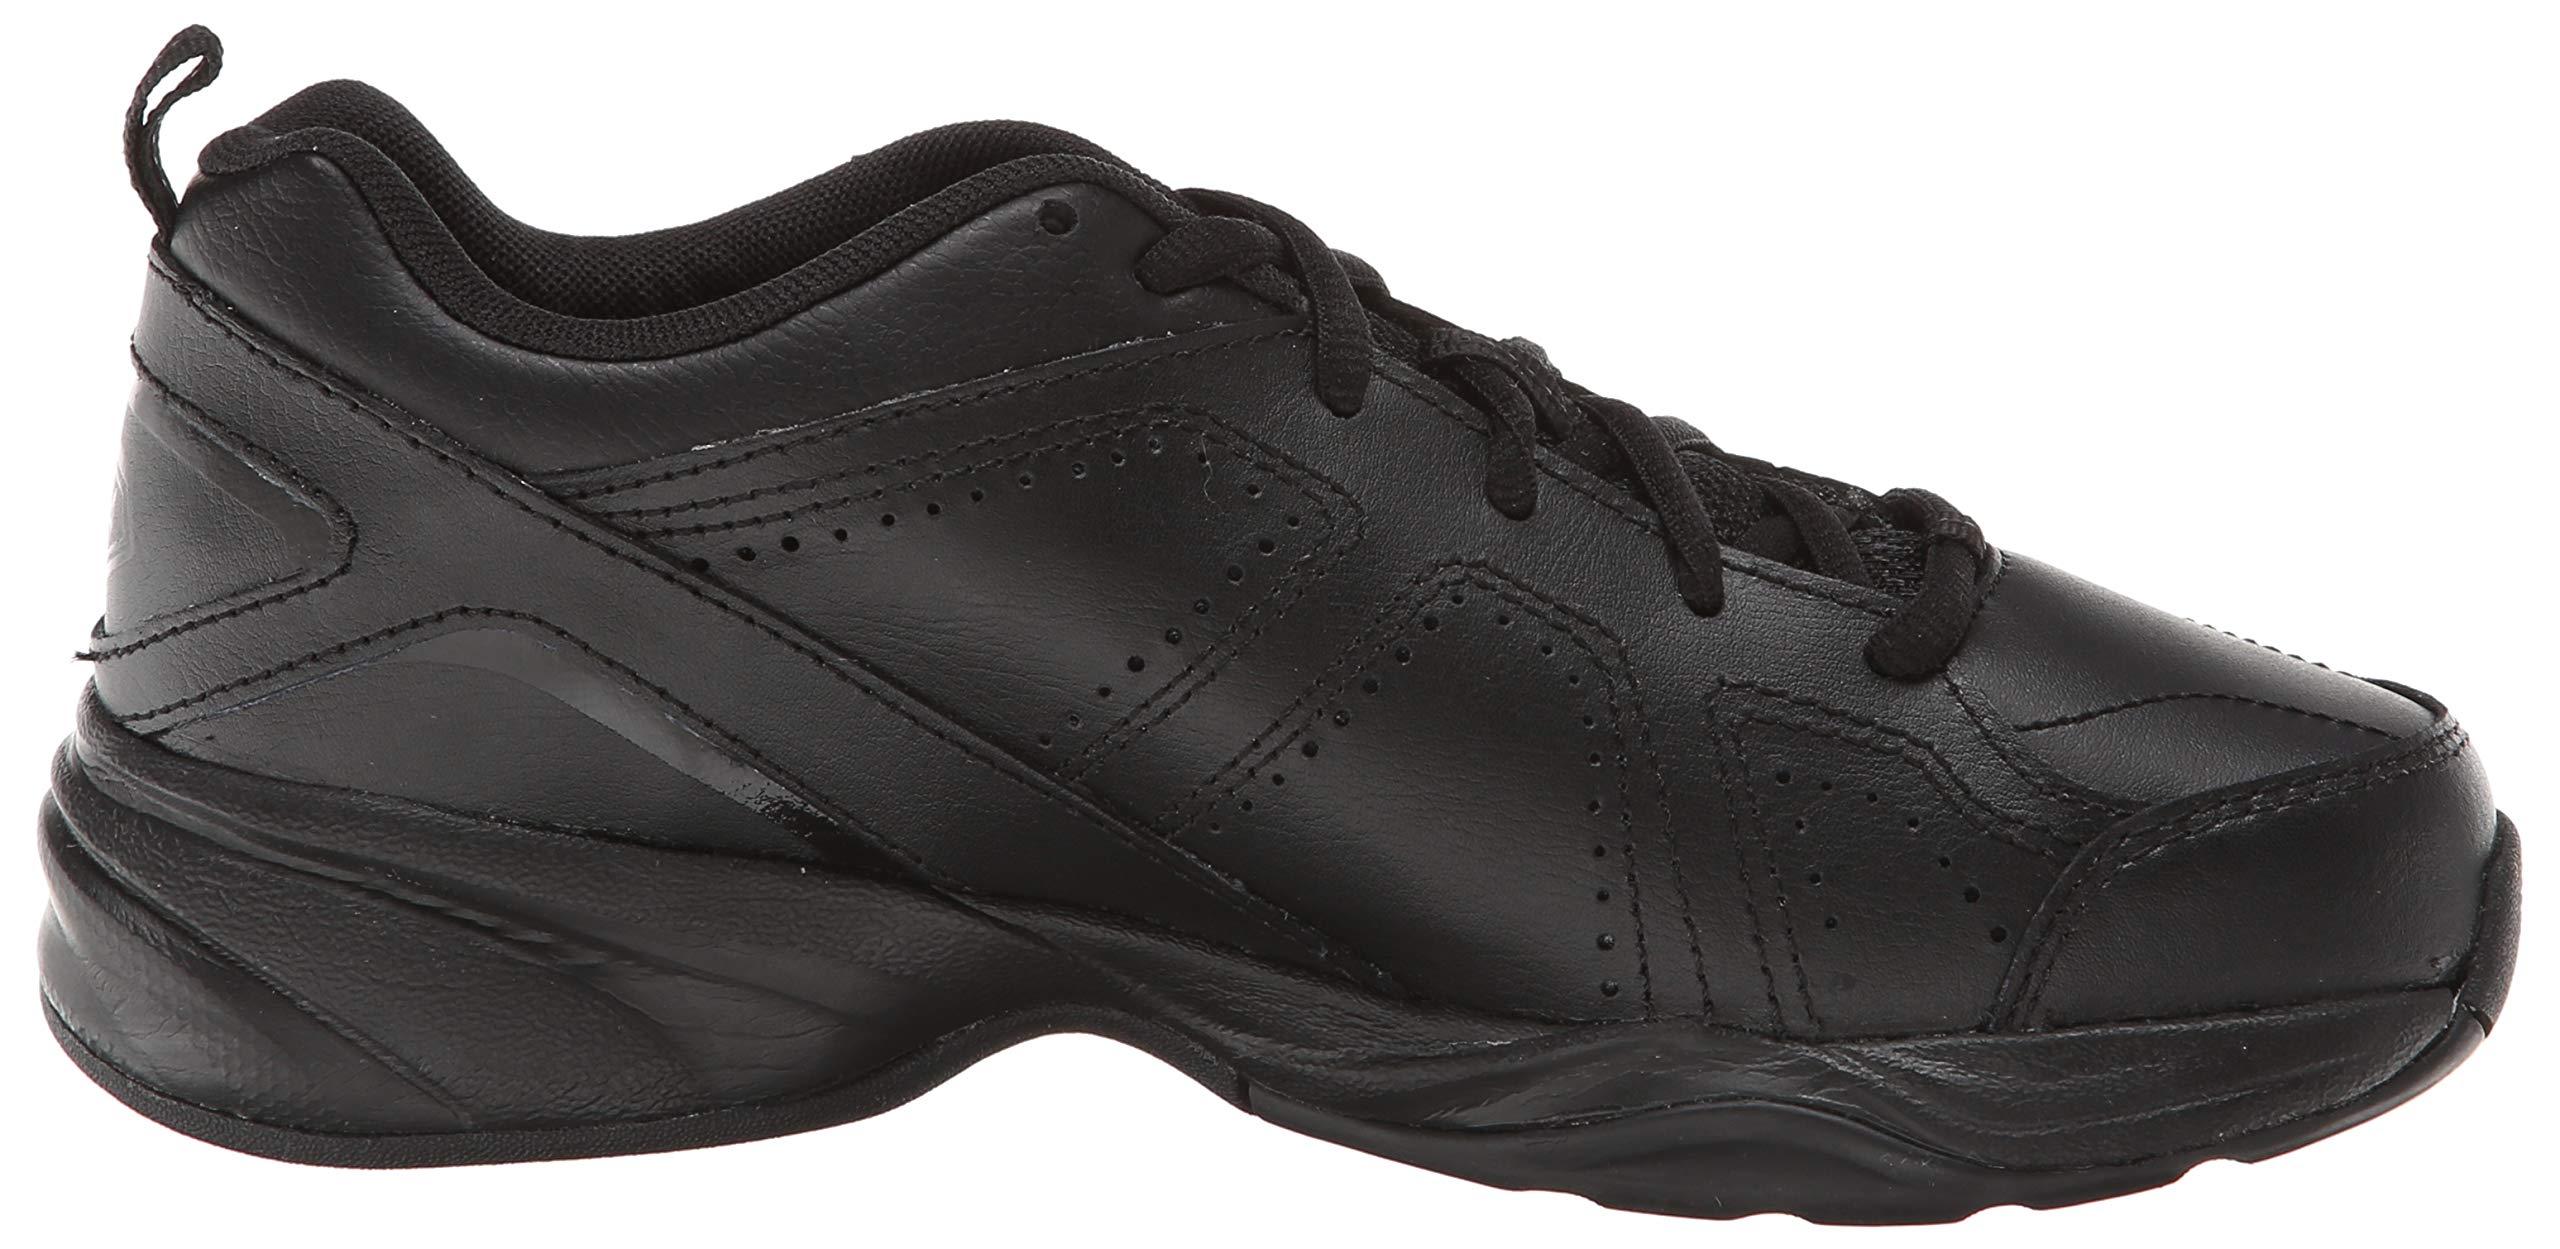 New Balance Boys KX624 Lace-Up Training Shoe ,Black,7 W US Big Kid by New Balance (Image #7)